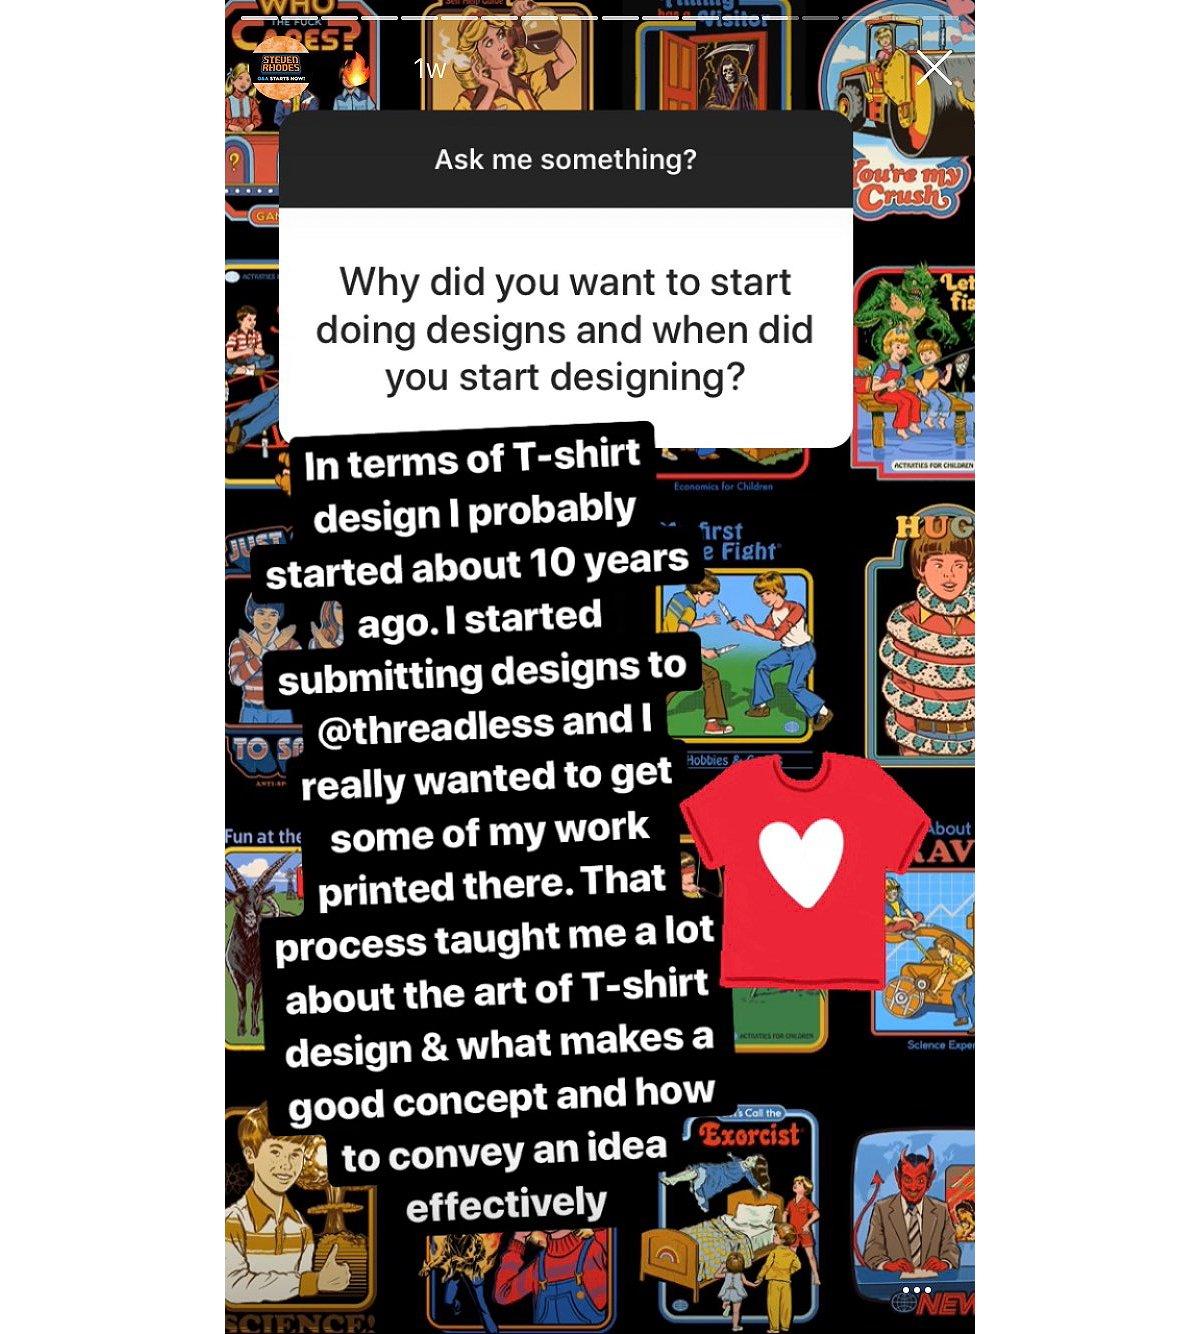 steven rhodes spencer's instagram interview when did you start designing